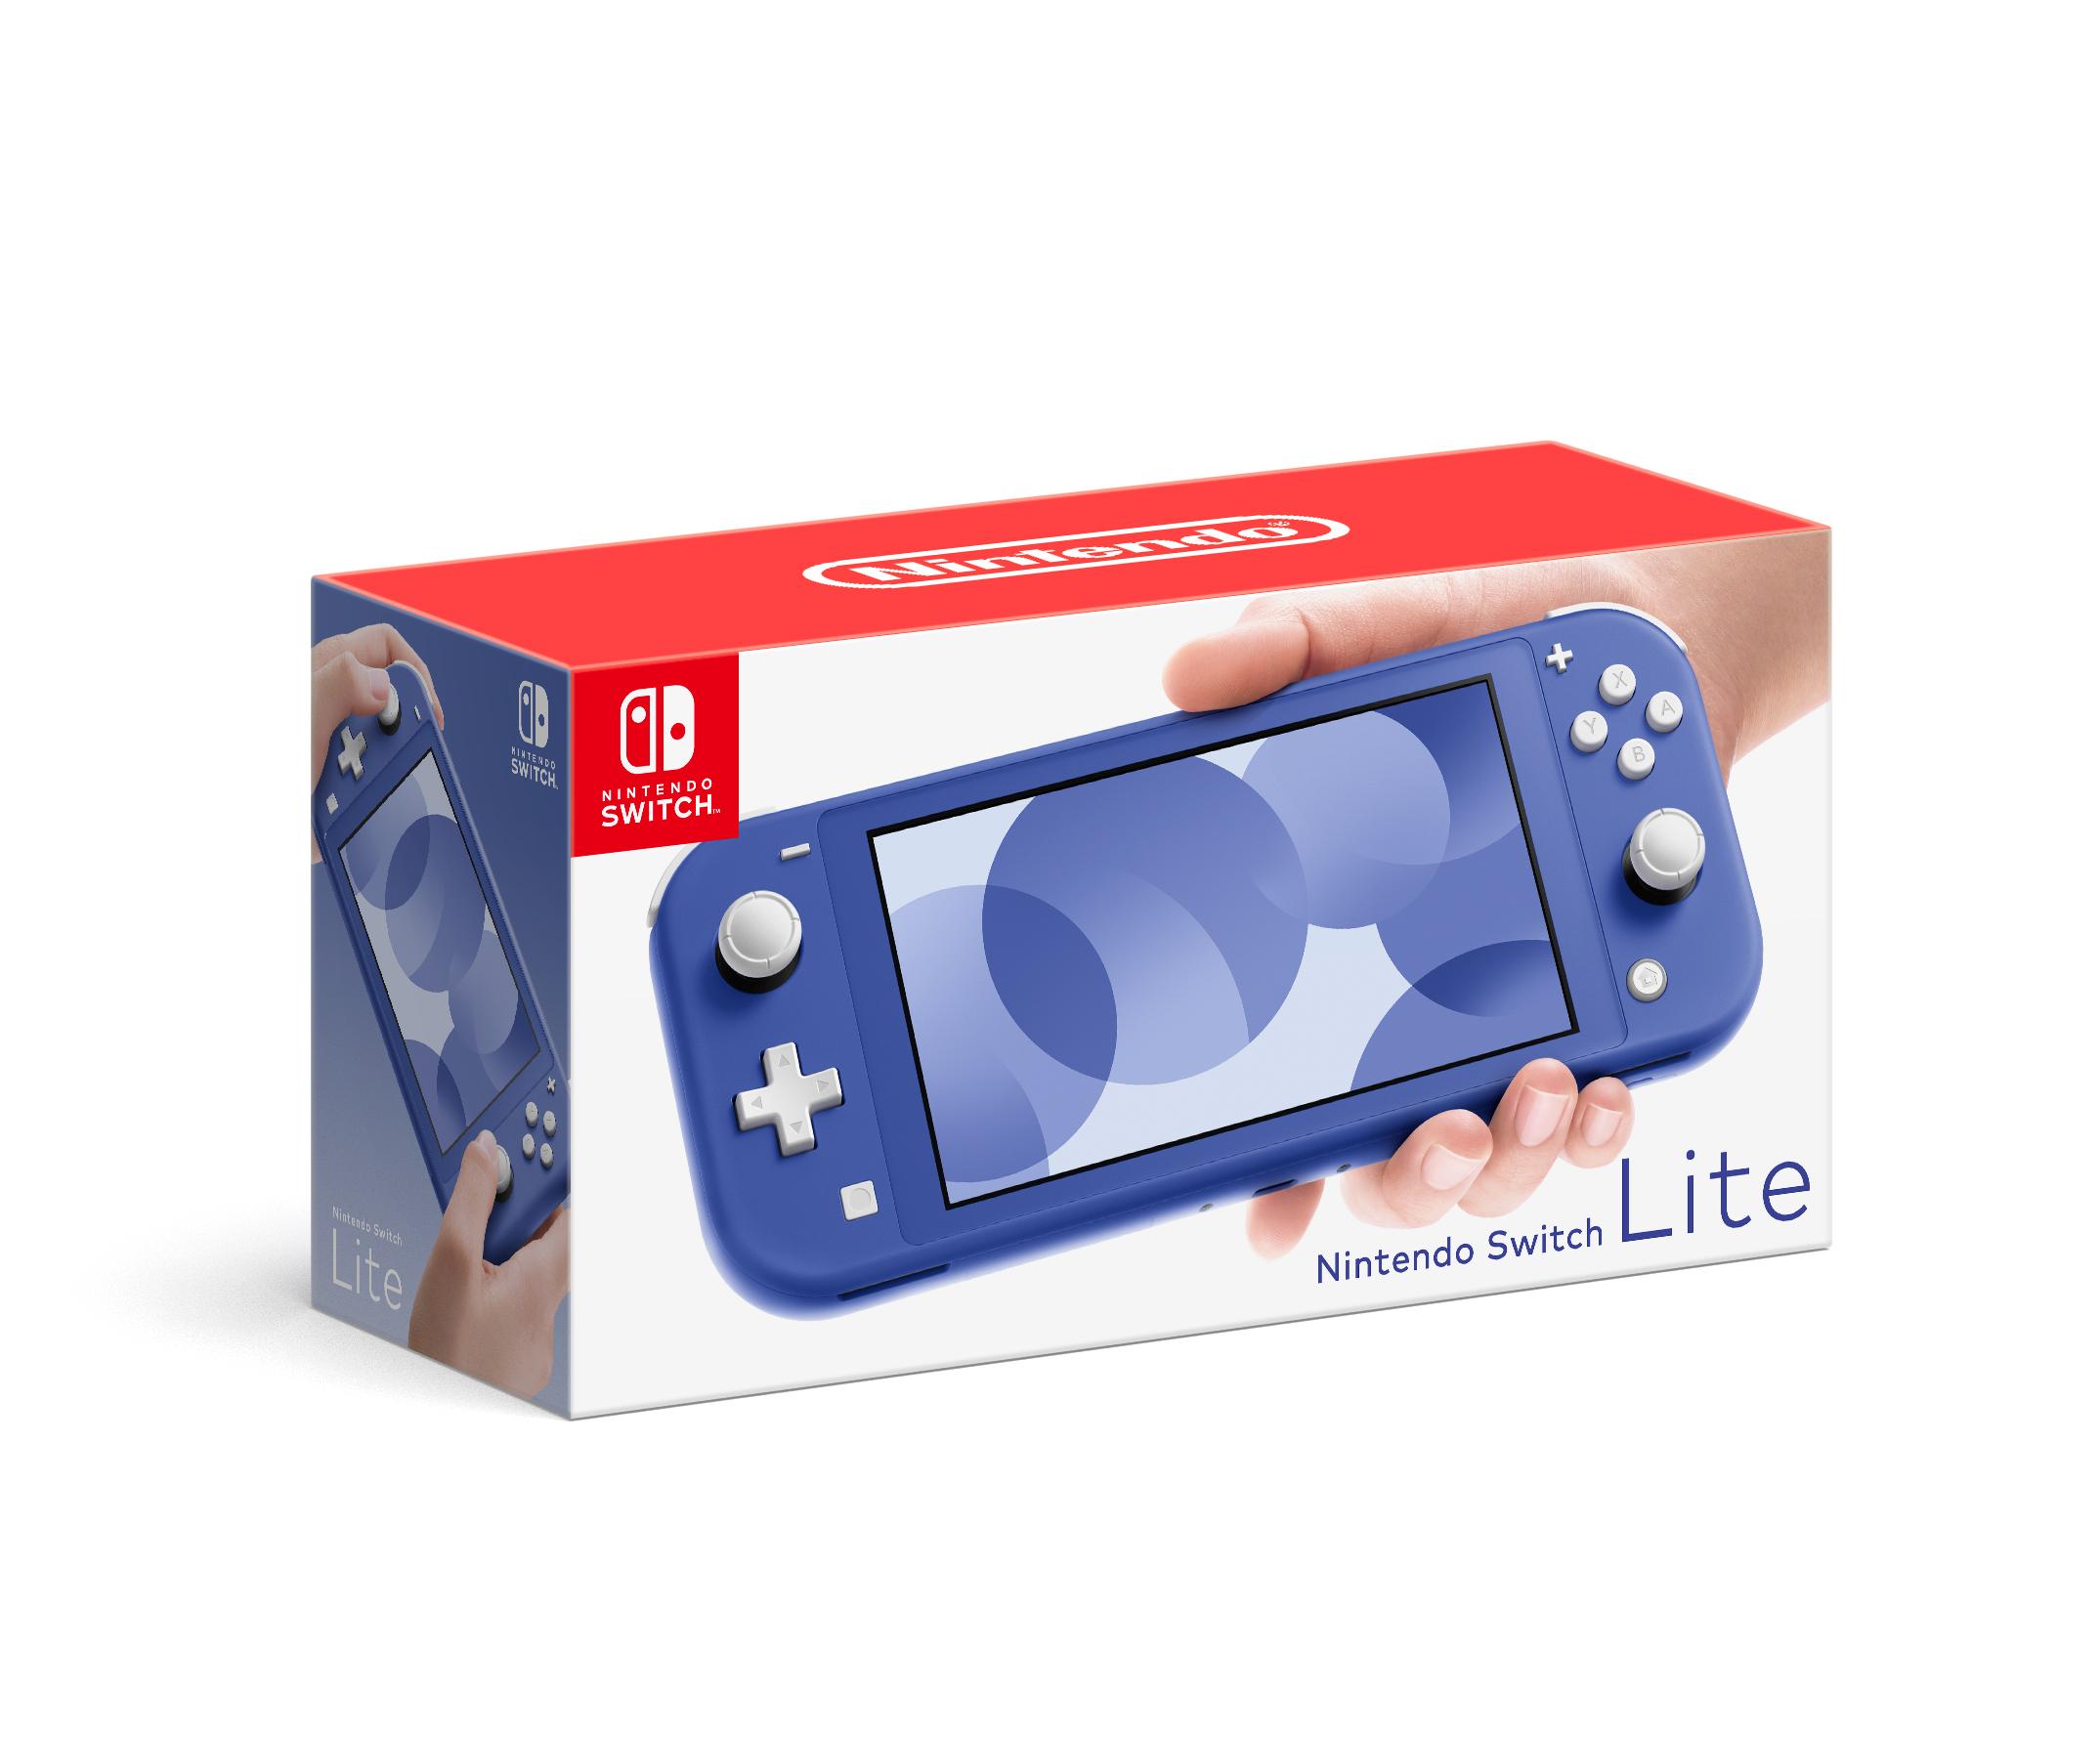 NintendoSwitchLiteBlue_1.jpg